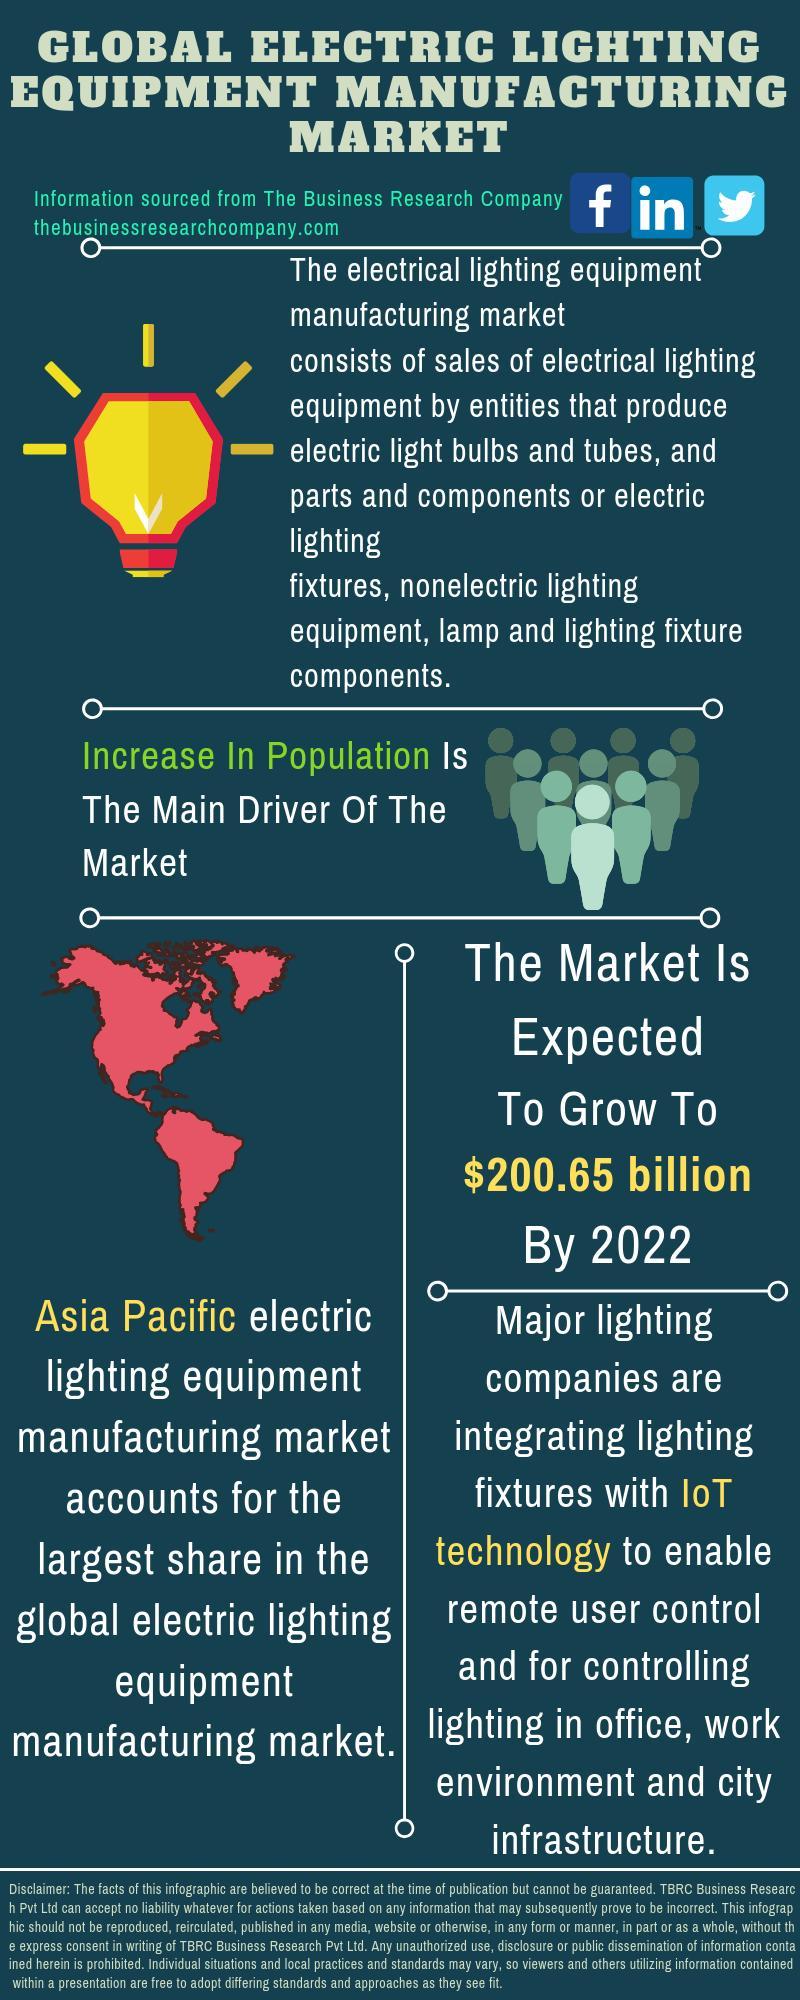 Electric Lighting Equipment Market